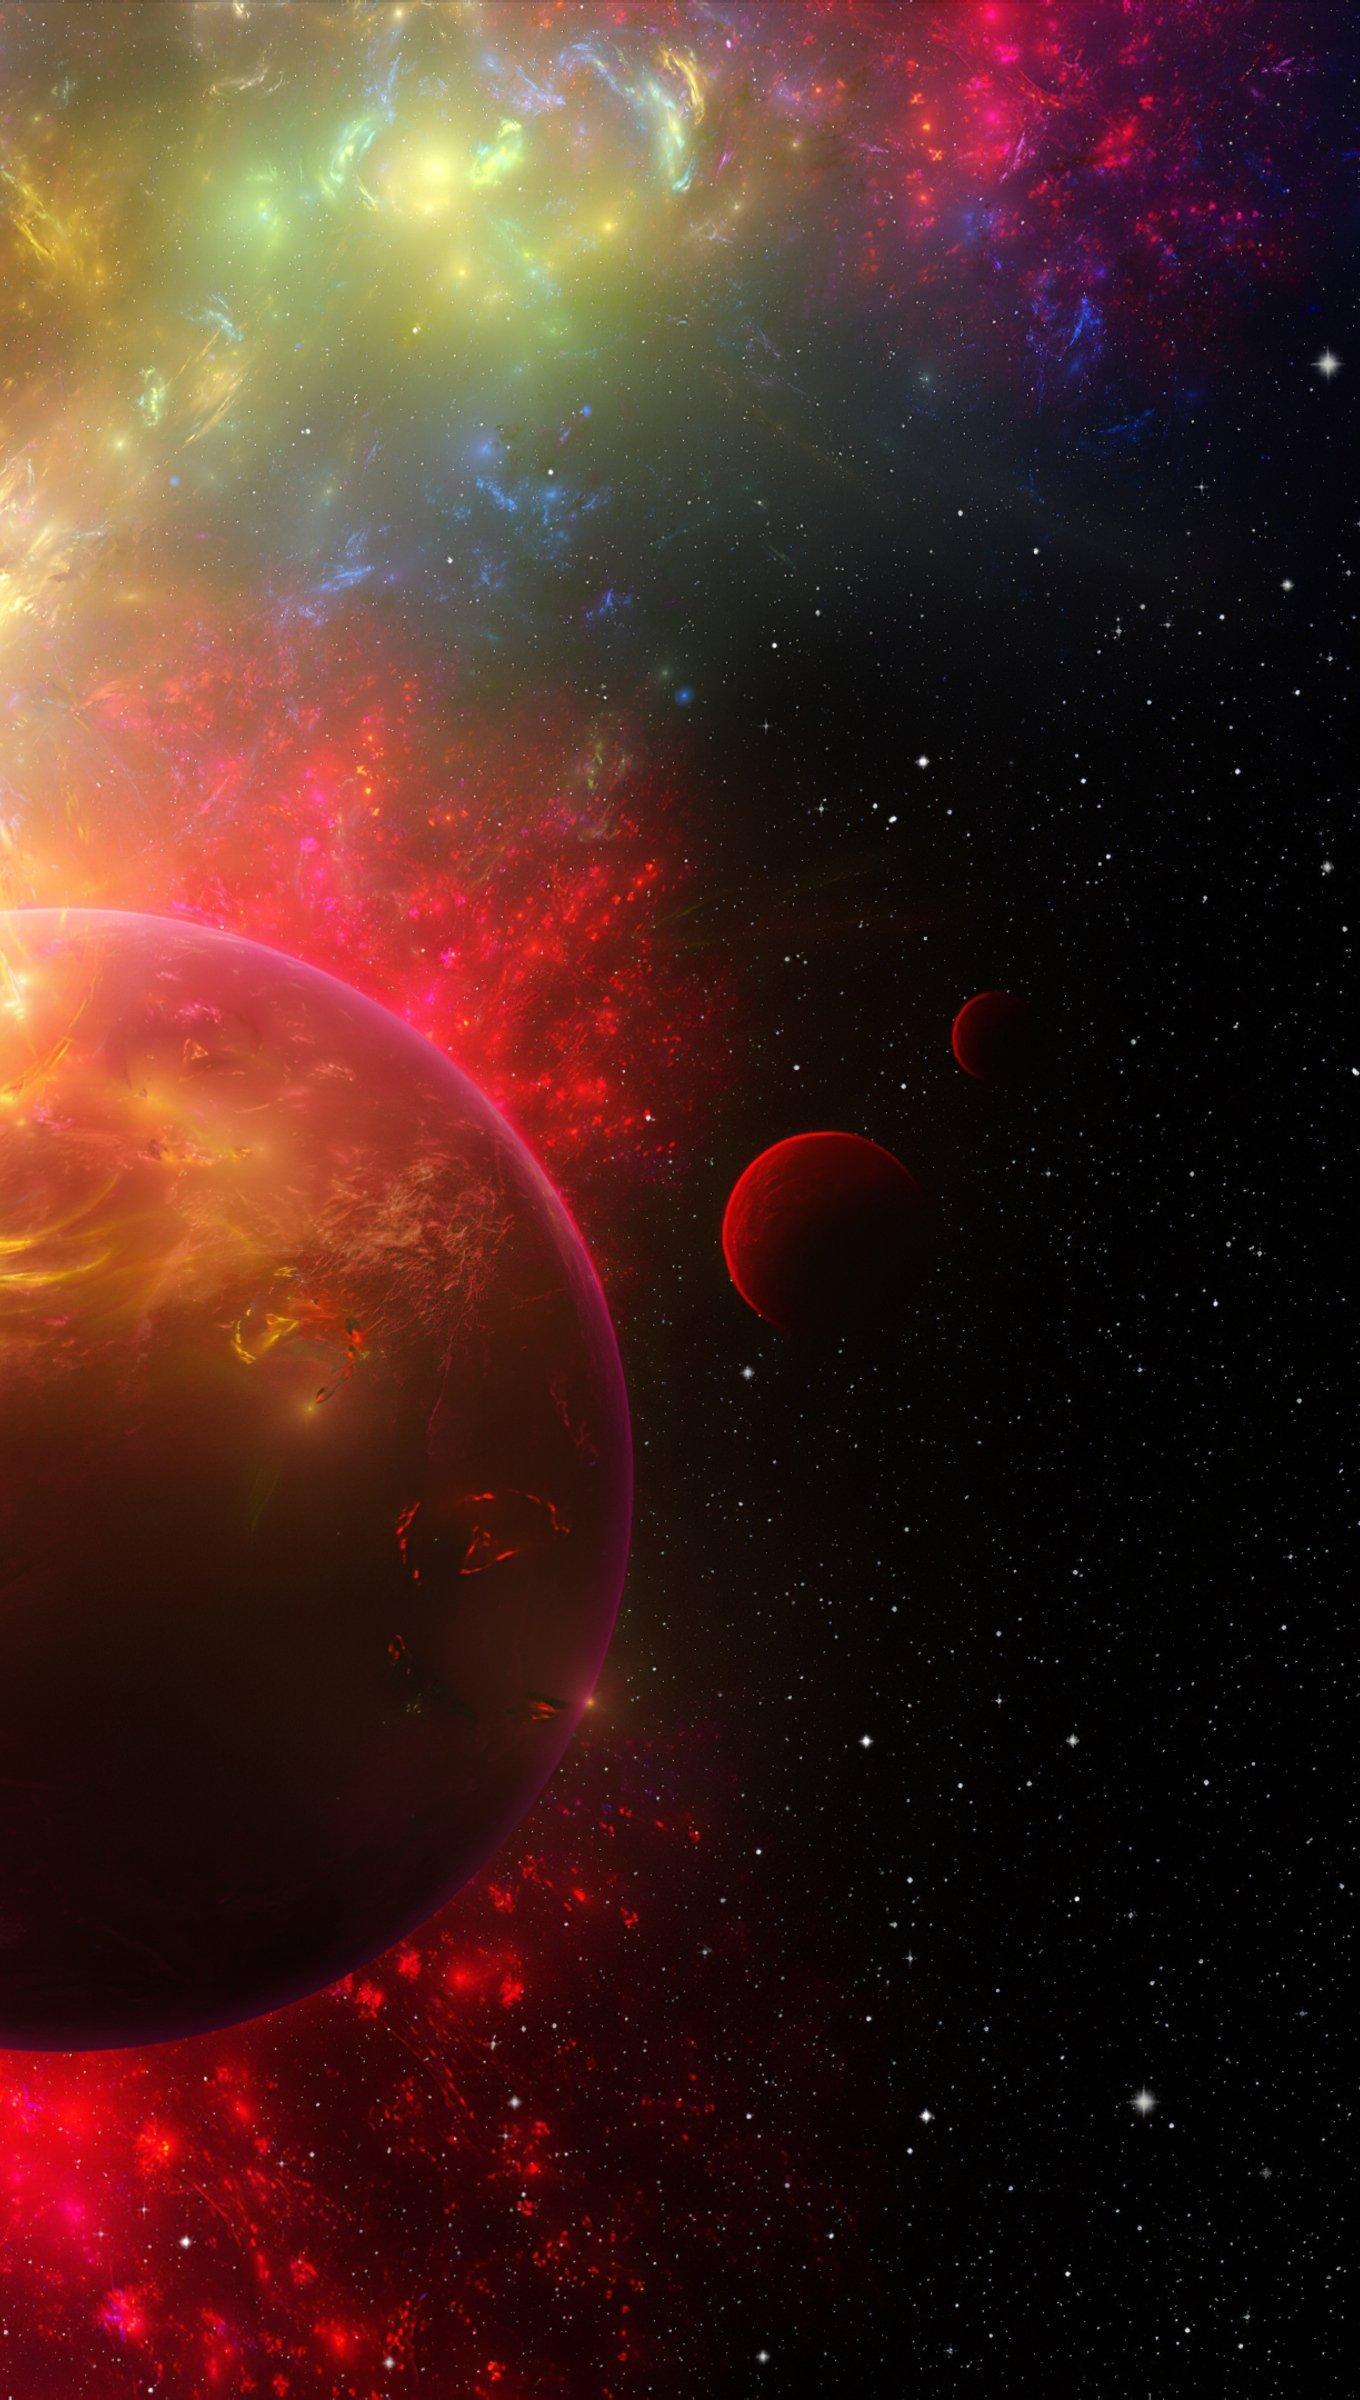 Fondos de pantalla Nebula alrededor de planeta Vertical